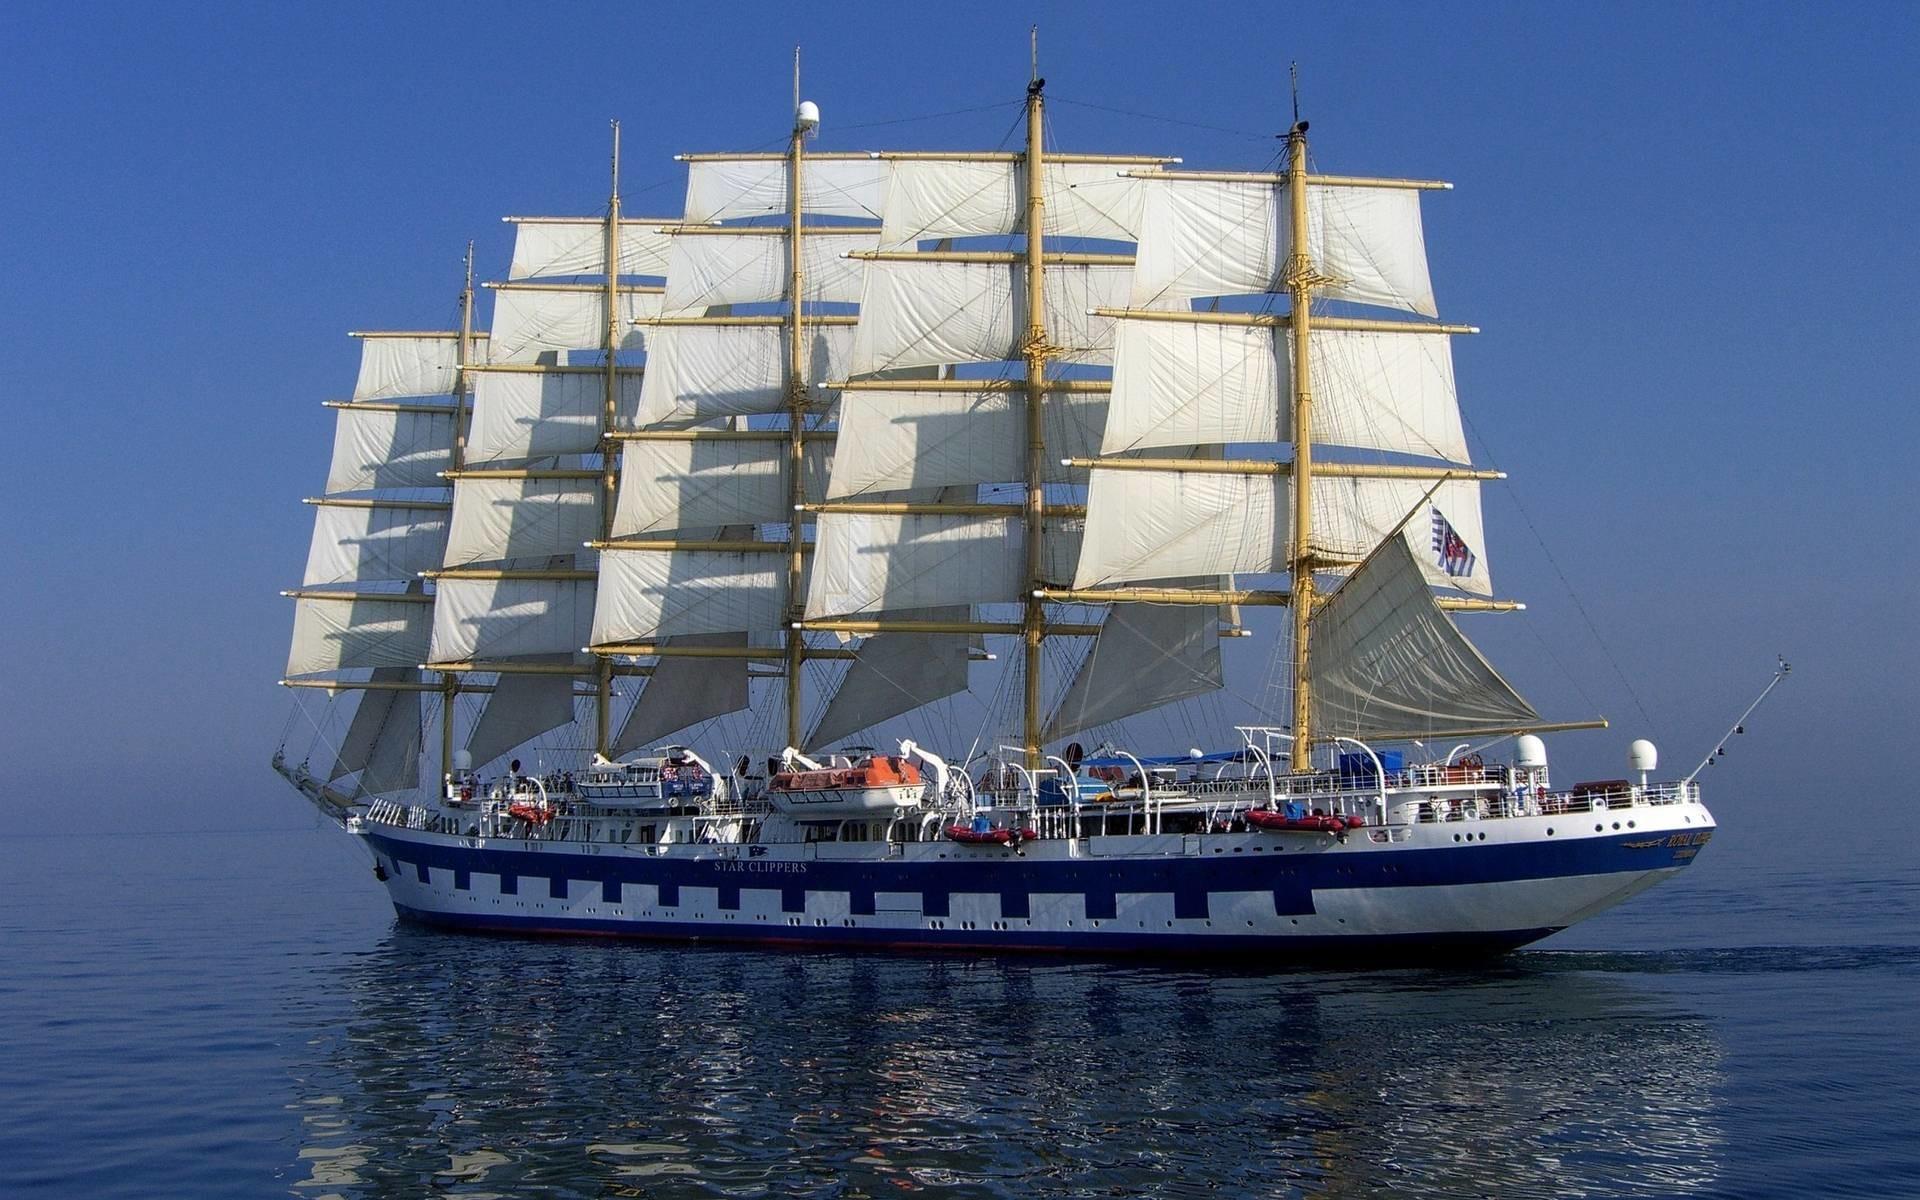 Res: 1920x1200, Hd Wallpapers Sailing Ship Paintings 1600 X 1200 684 Kb Jpeg | HD .